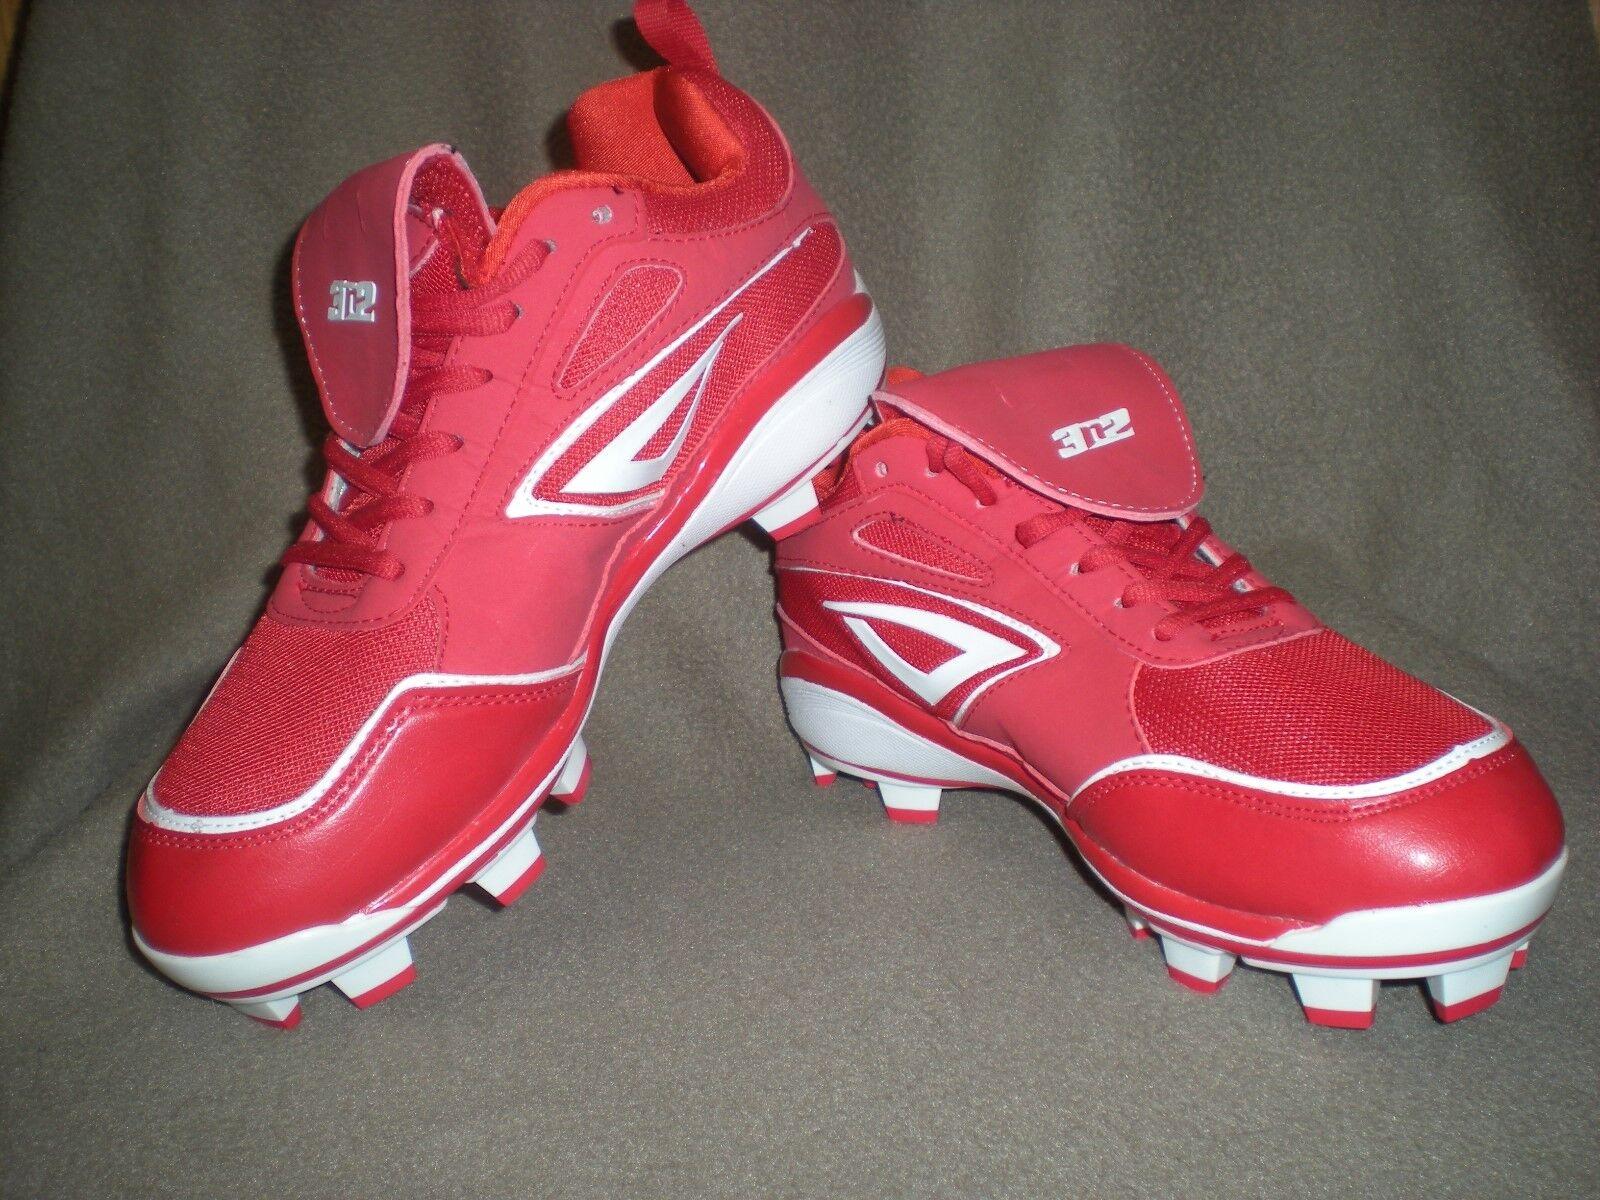 3N2 Red Rally PM TPU Baseball Softball Cleats Red Size 7